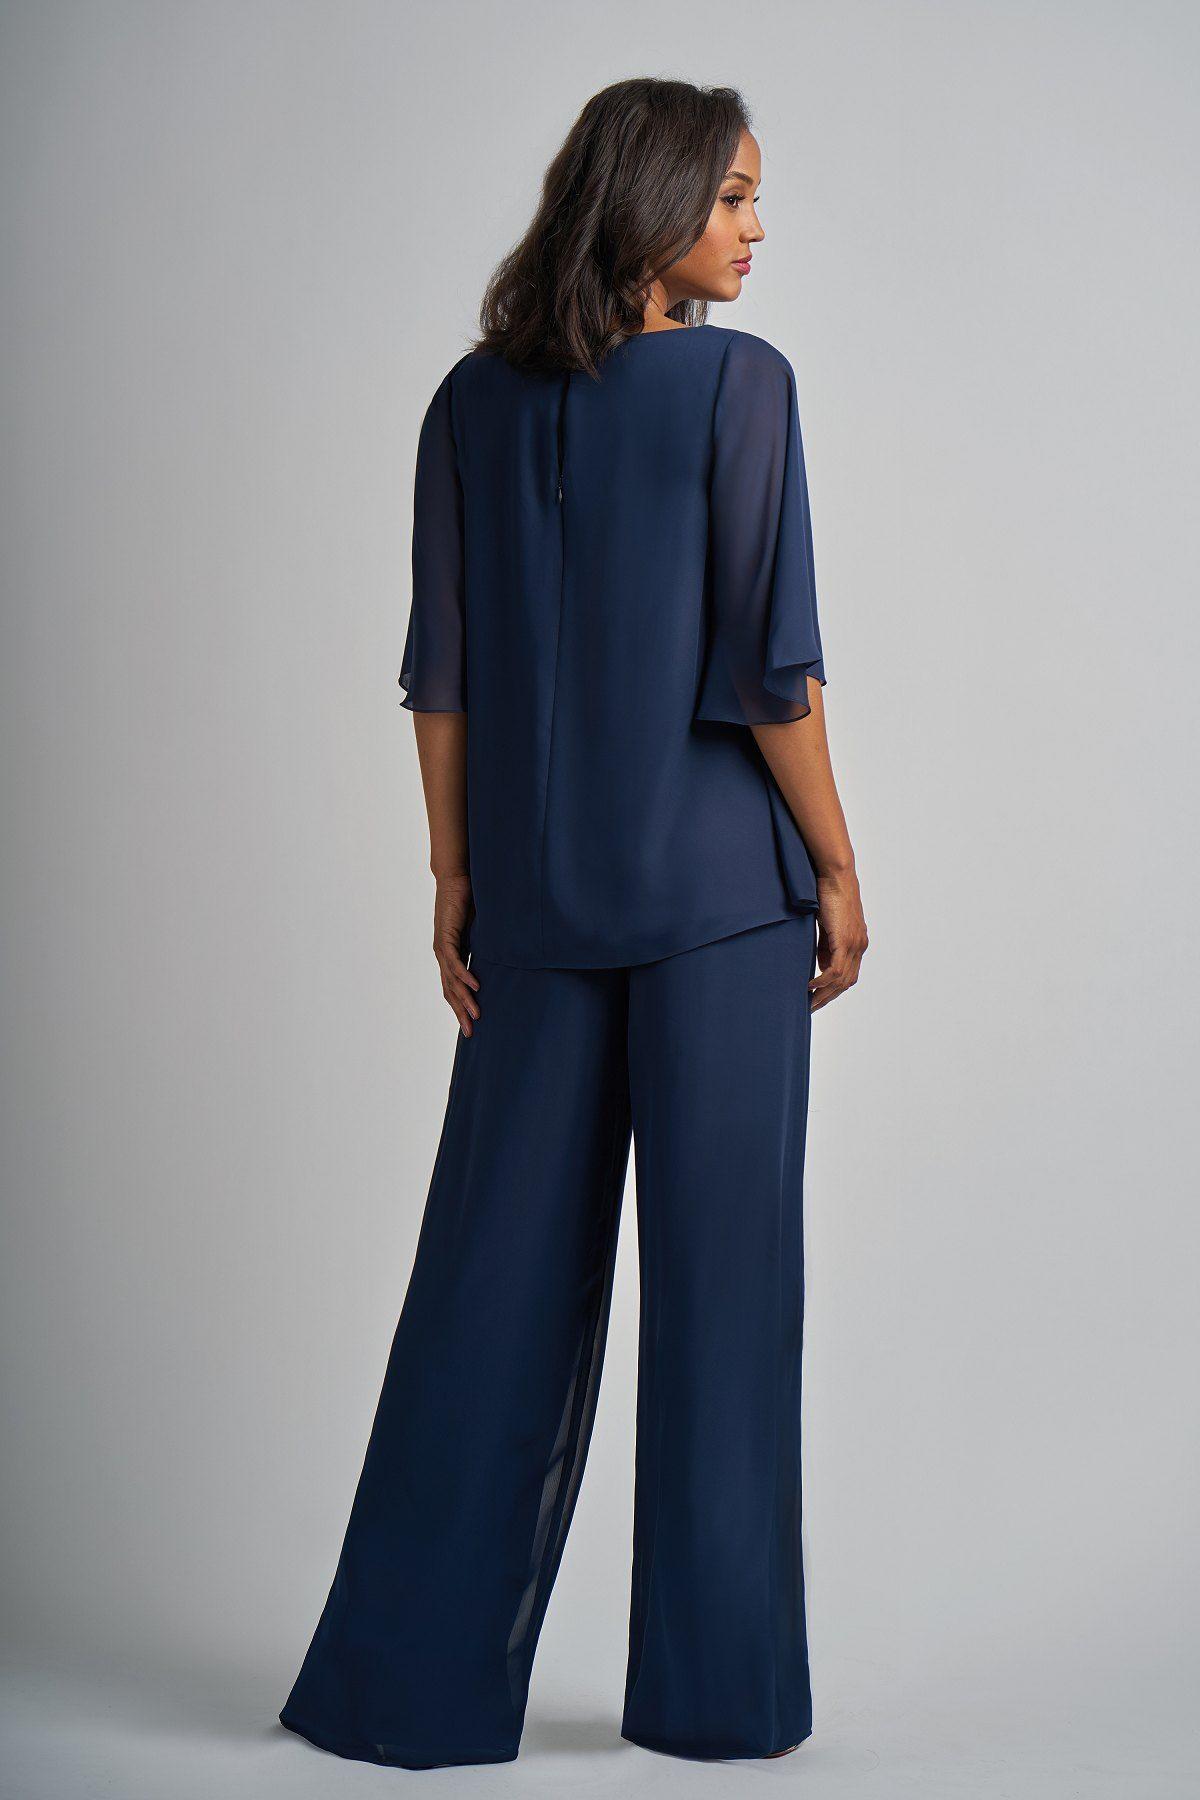 18fe84b50e087 M210009 Charlotte Chiffon MOB Pant Suit with Boat Neckline | Jasmine ...